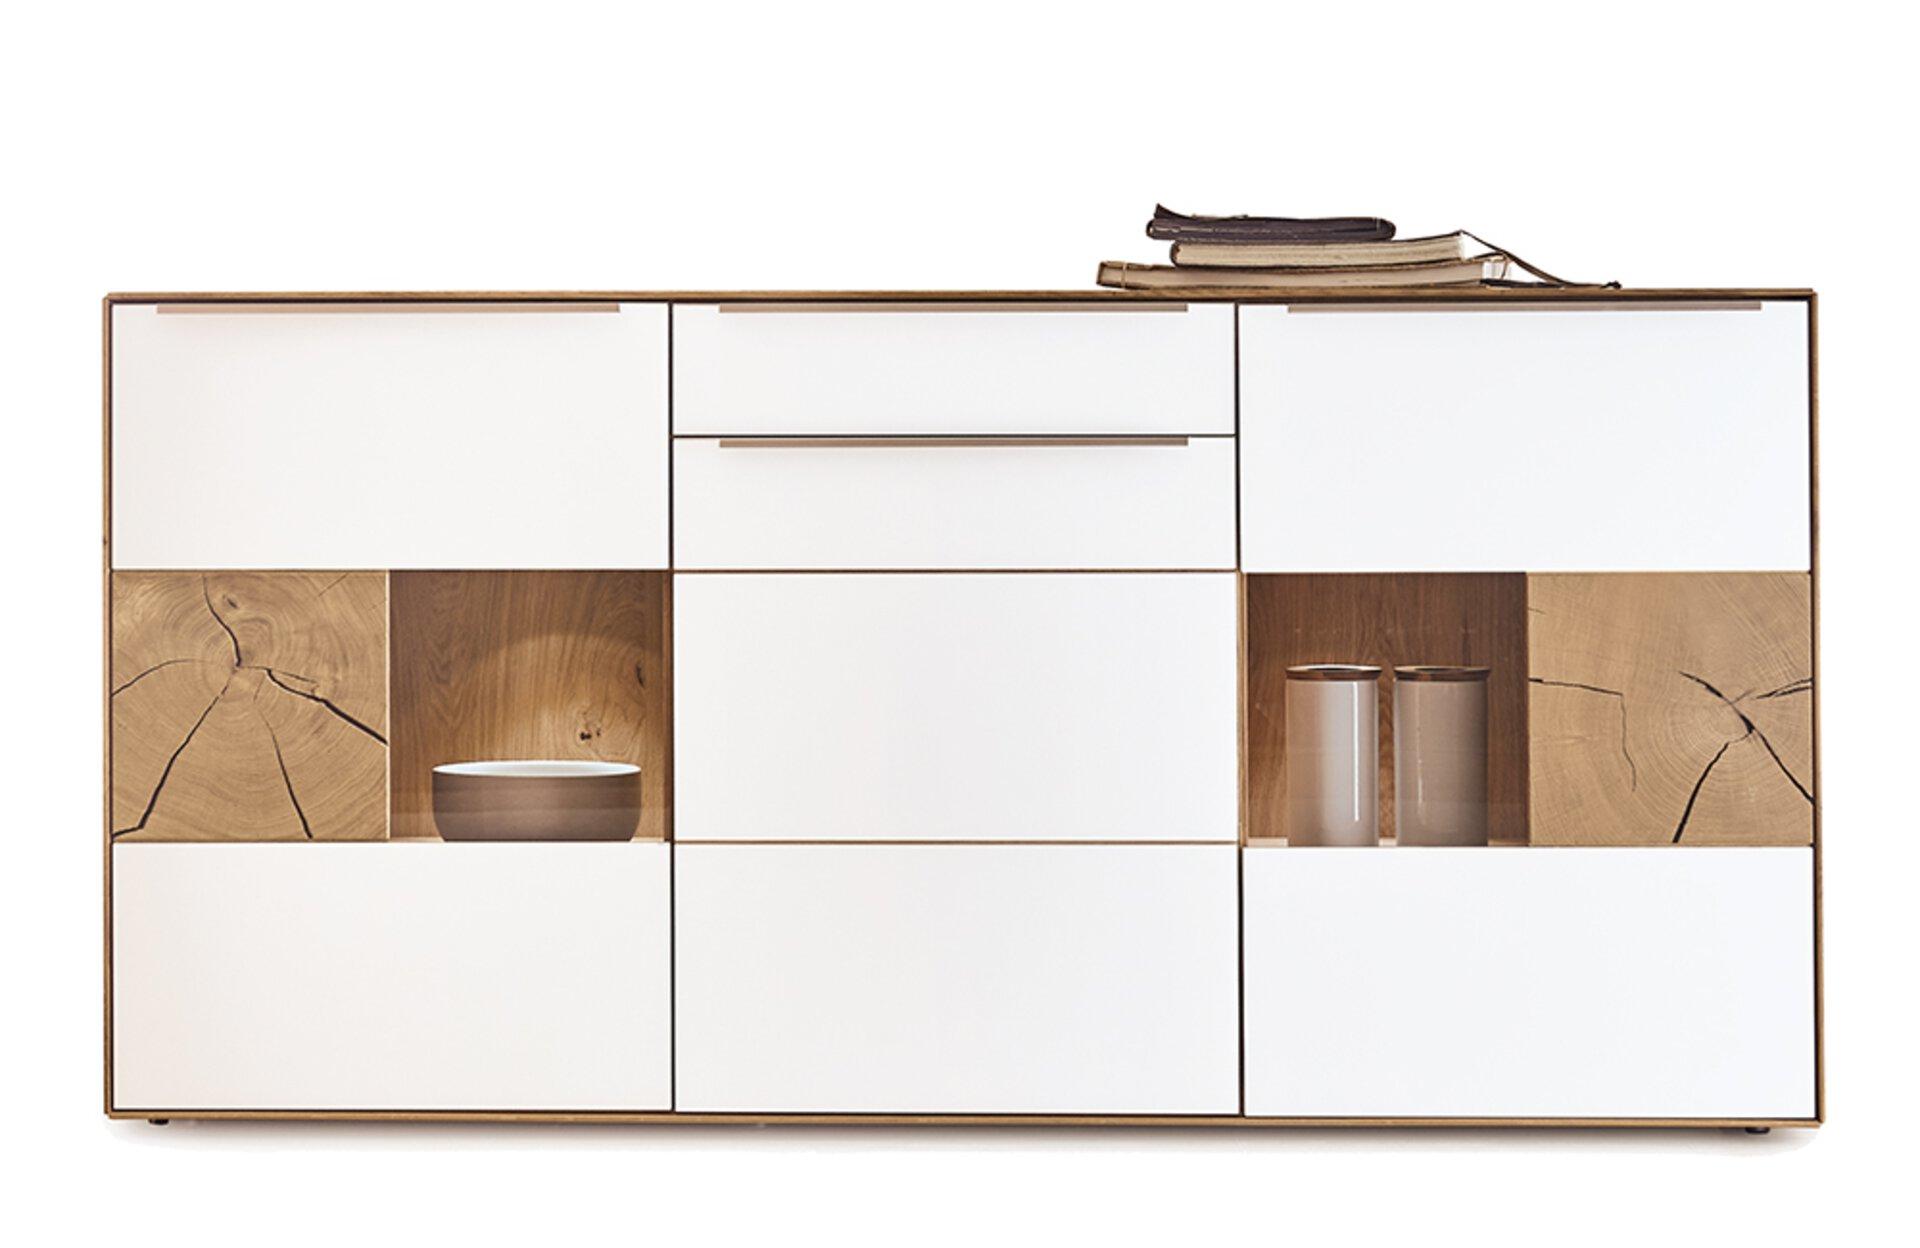 Sideboard TALVERA VALMONDO Holzwerkstoff 90 x 47 x 182 cm